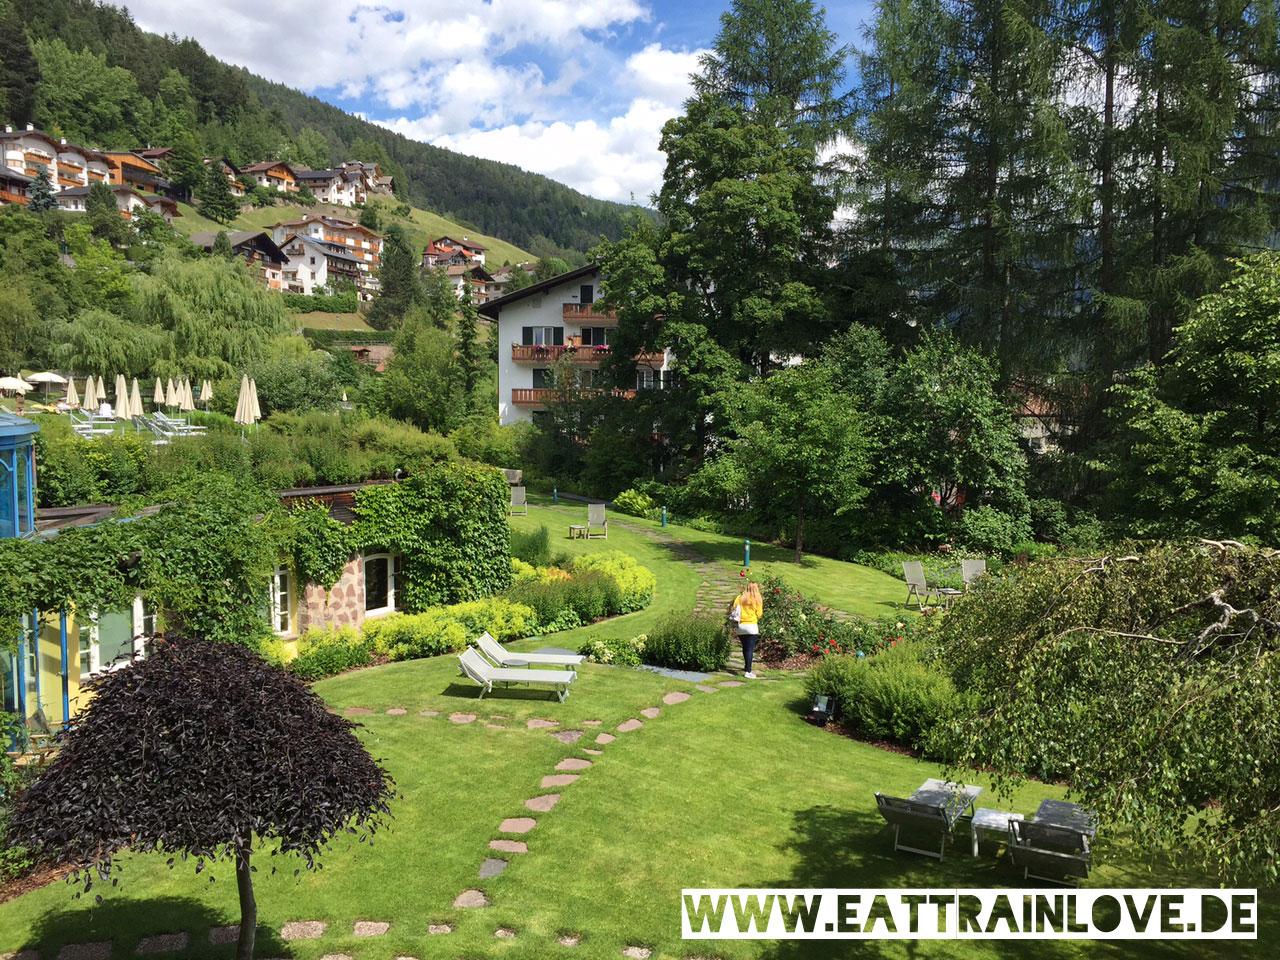 Adler-Dolomiti-Garteansicht